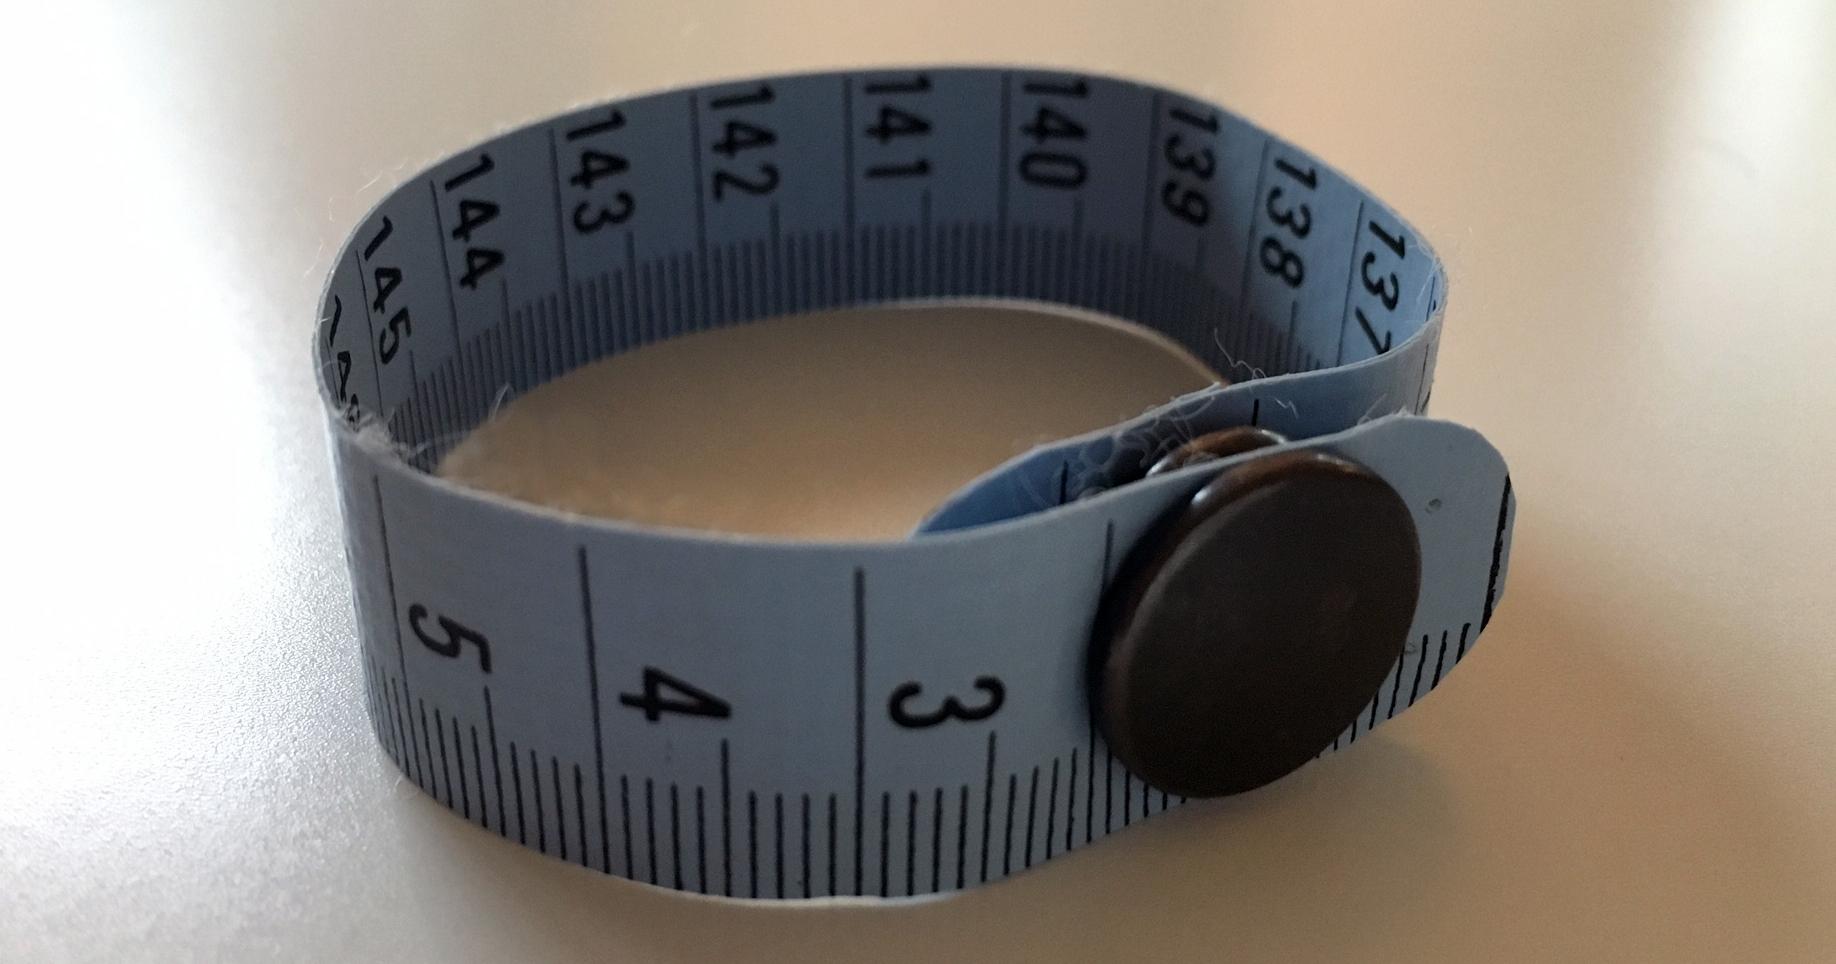 armband-meetlint-1